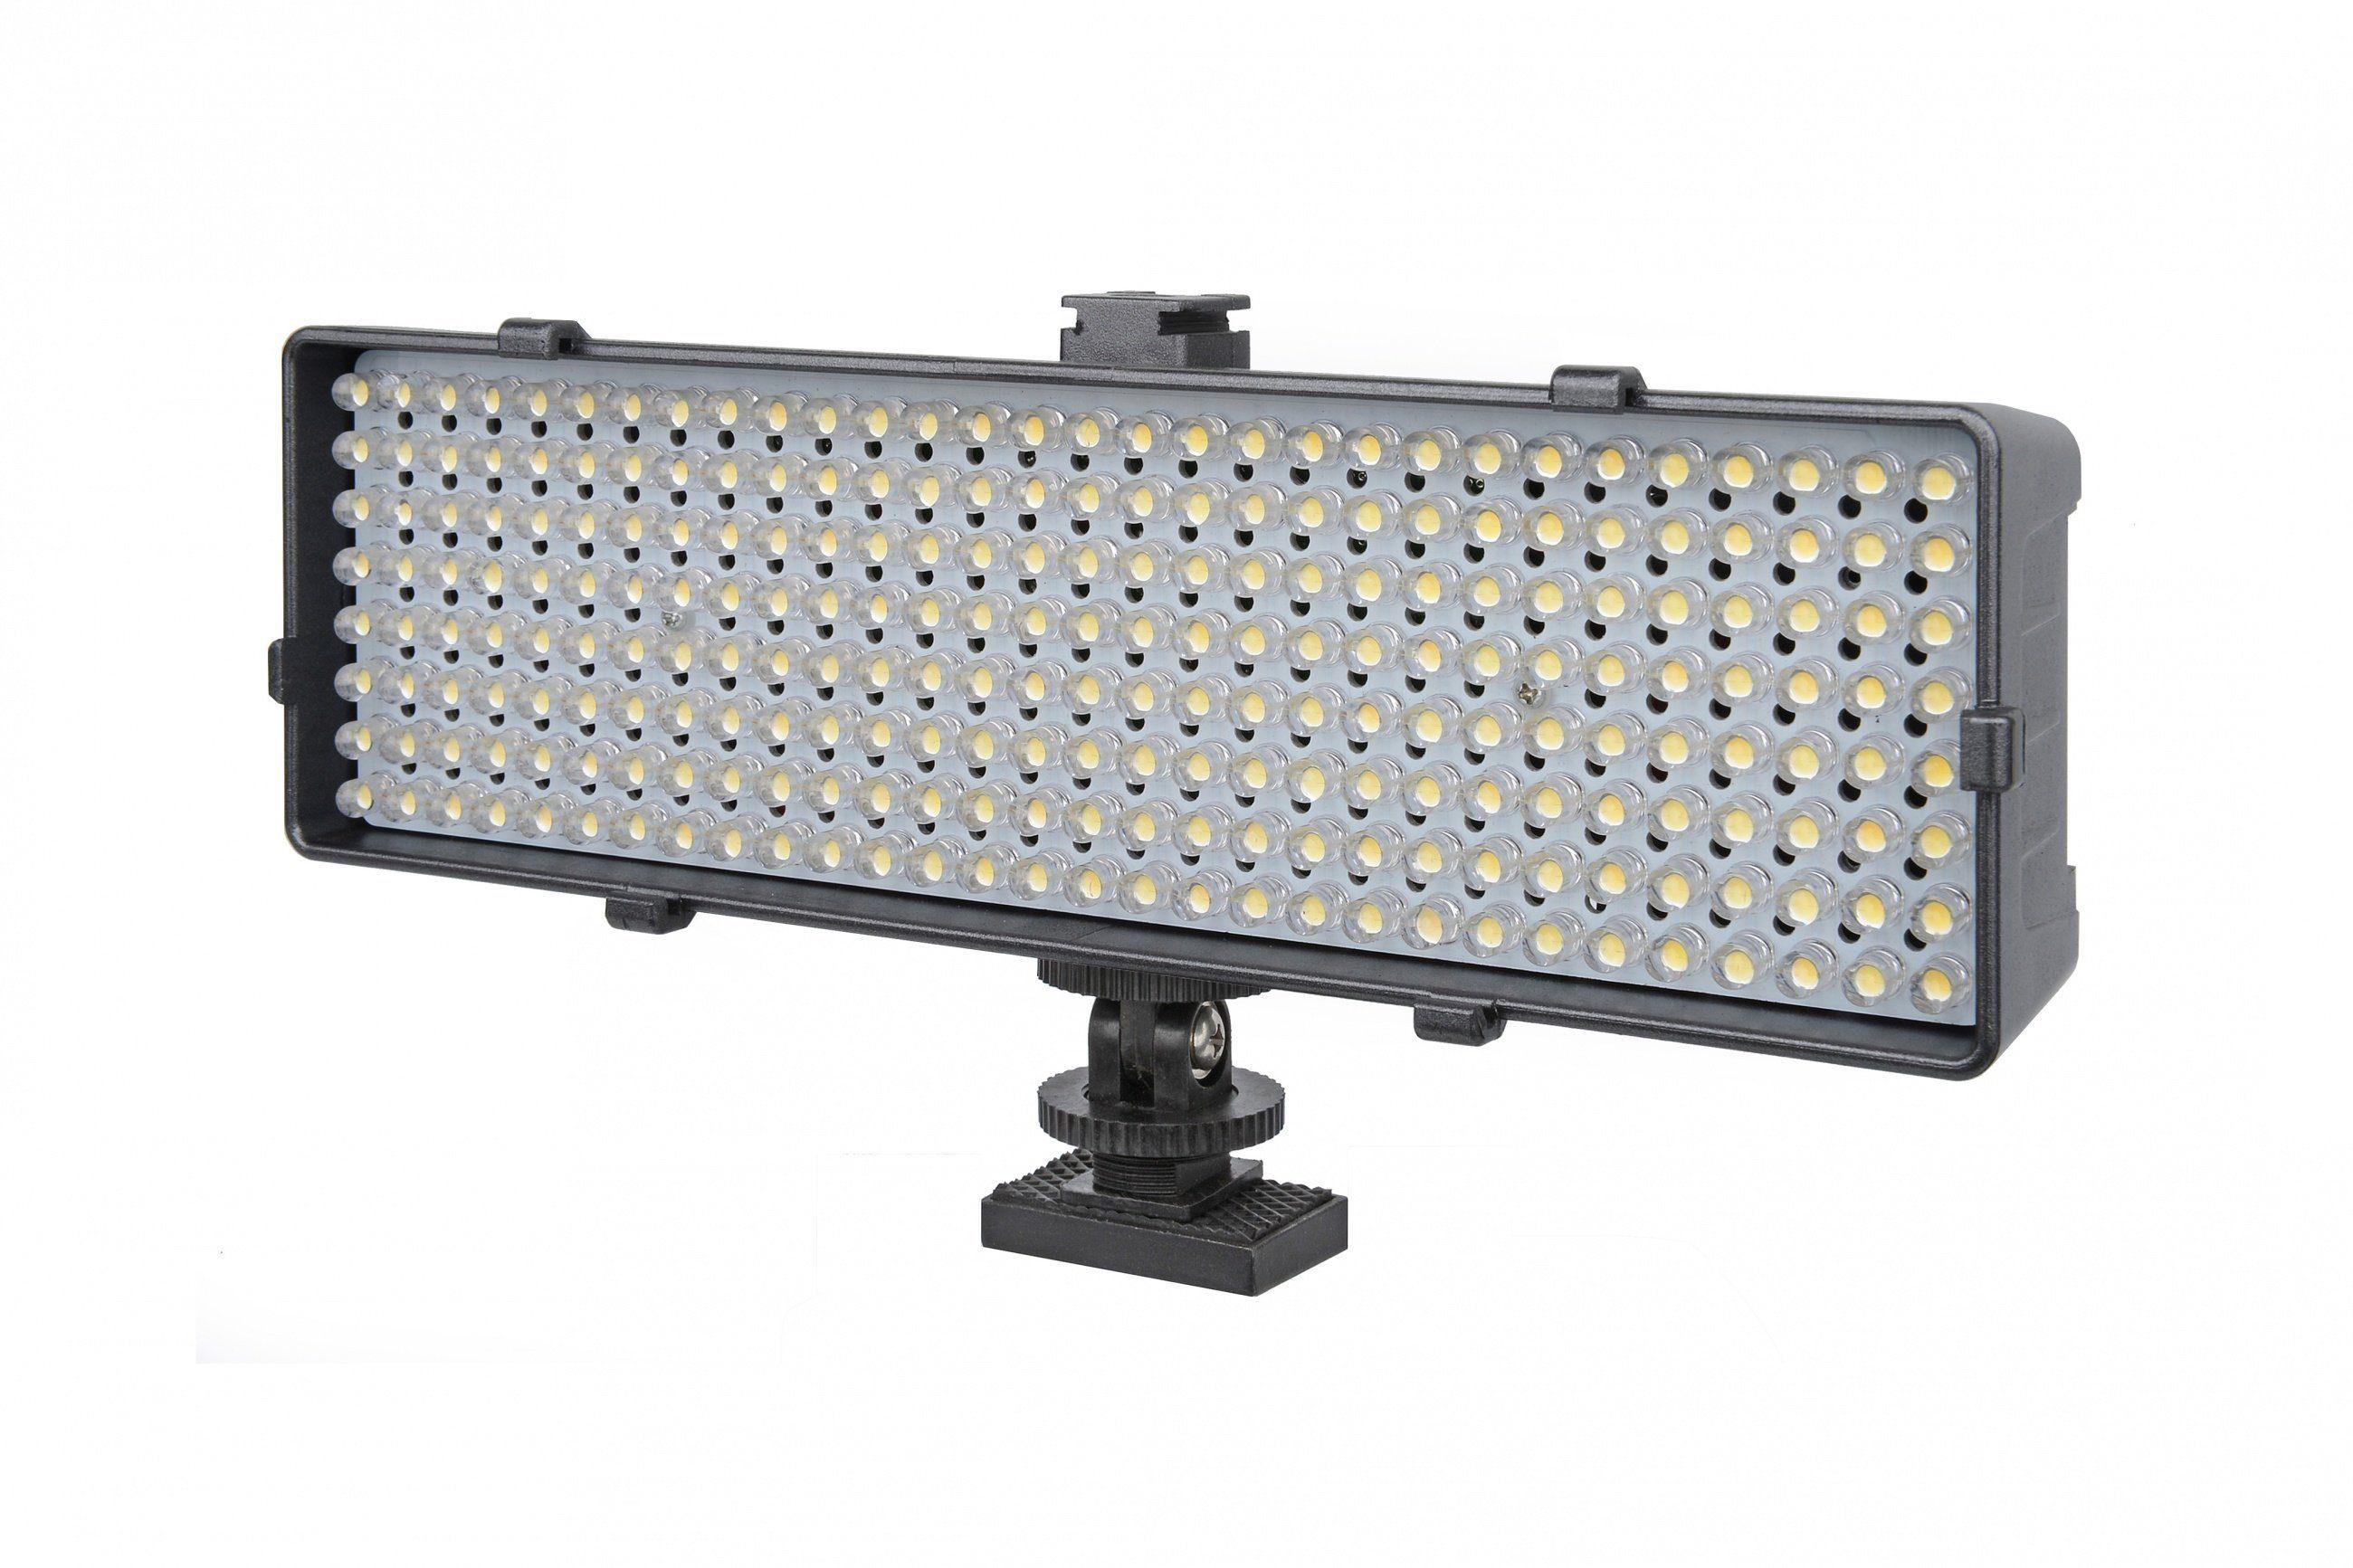 Bresser Fotostudio »S-240 LED Videoleuchte 14.4W/2200LUX«